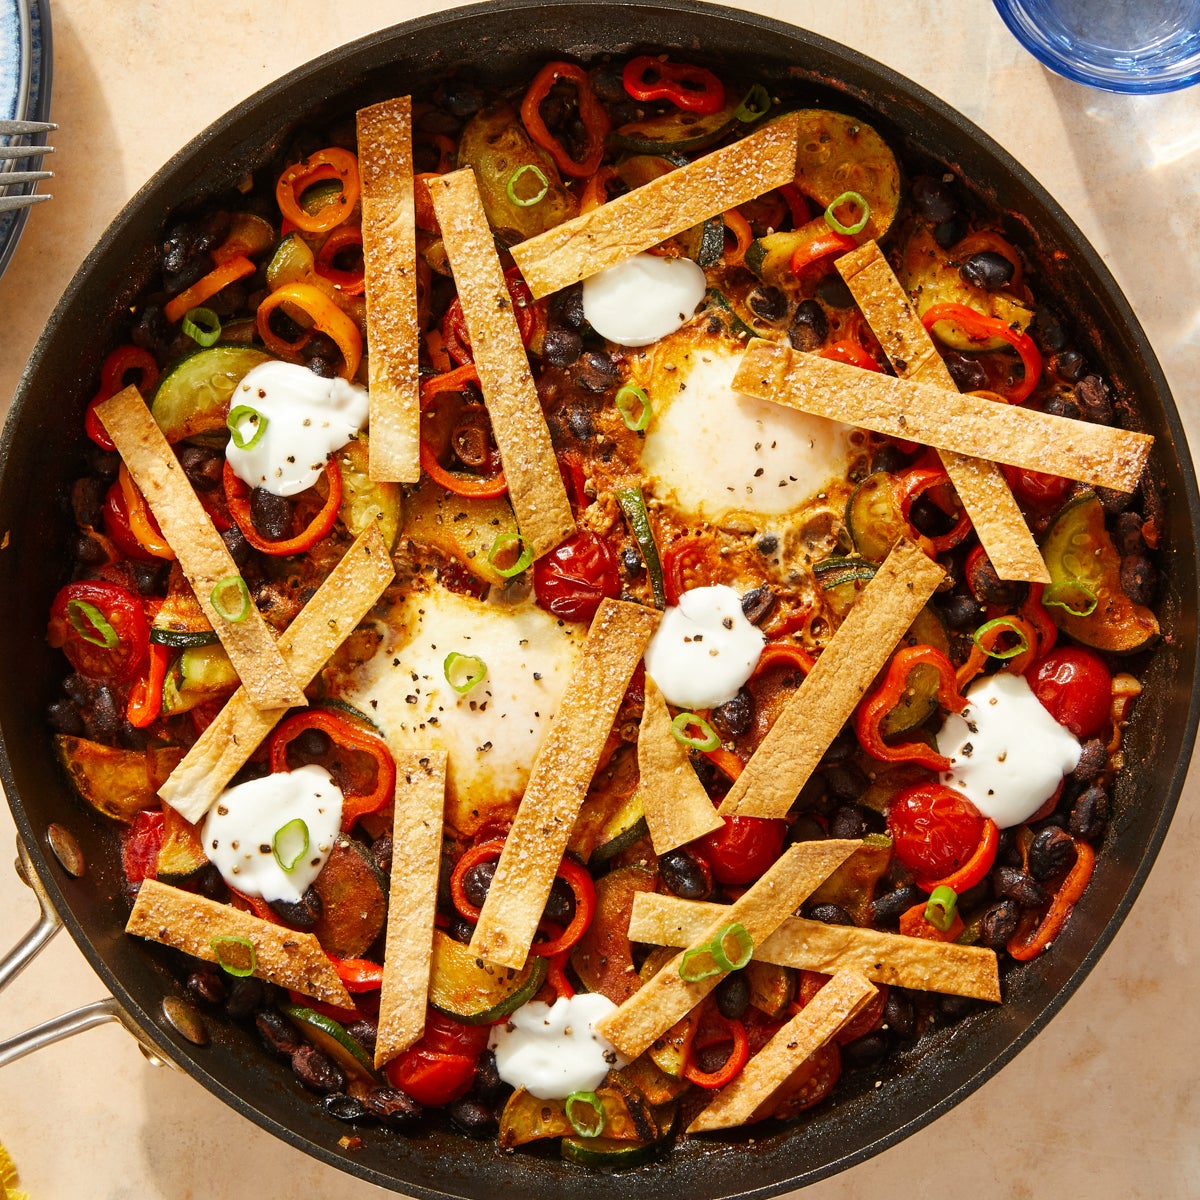 Smoky Black Bean & Vegetable Skillet with Eggs & Crispy Tortilla Strips